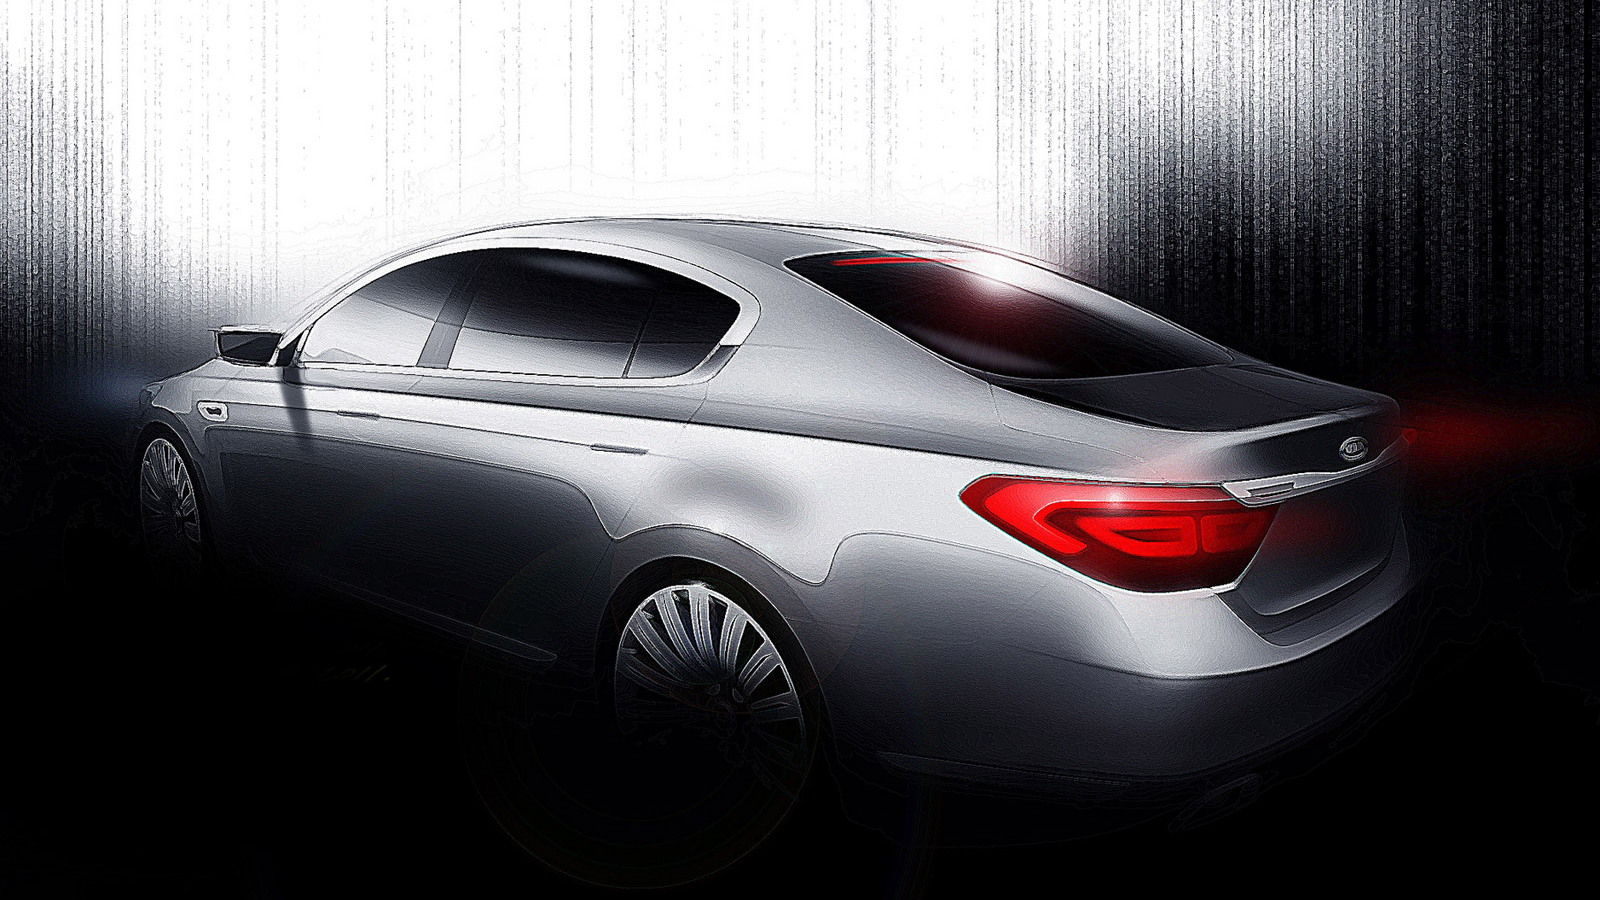 2013 Kia KH rear-wheel drive sedan teaser